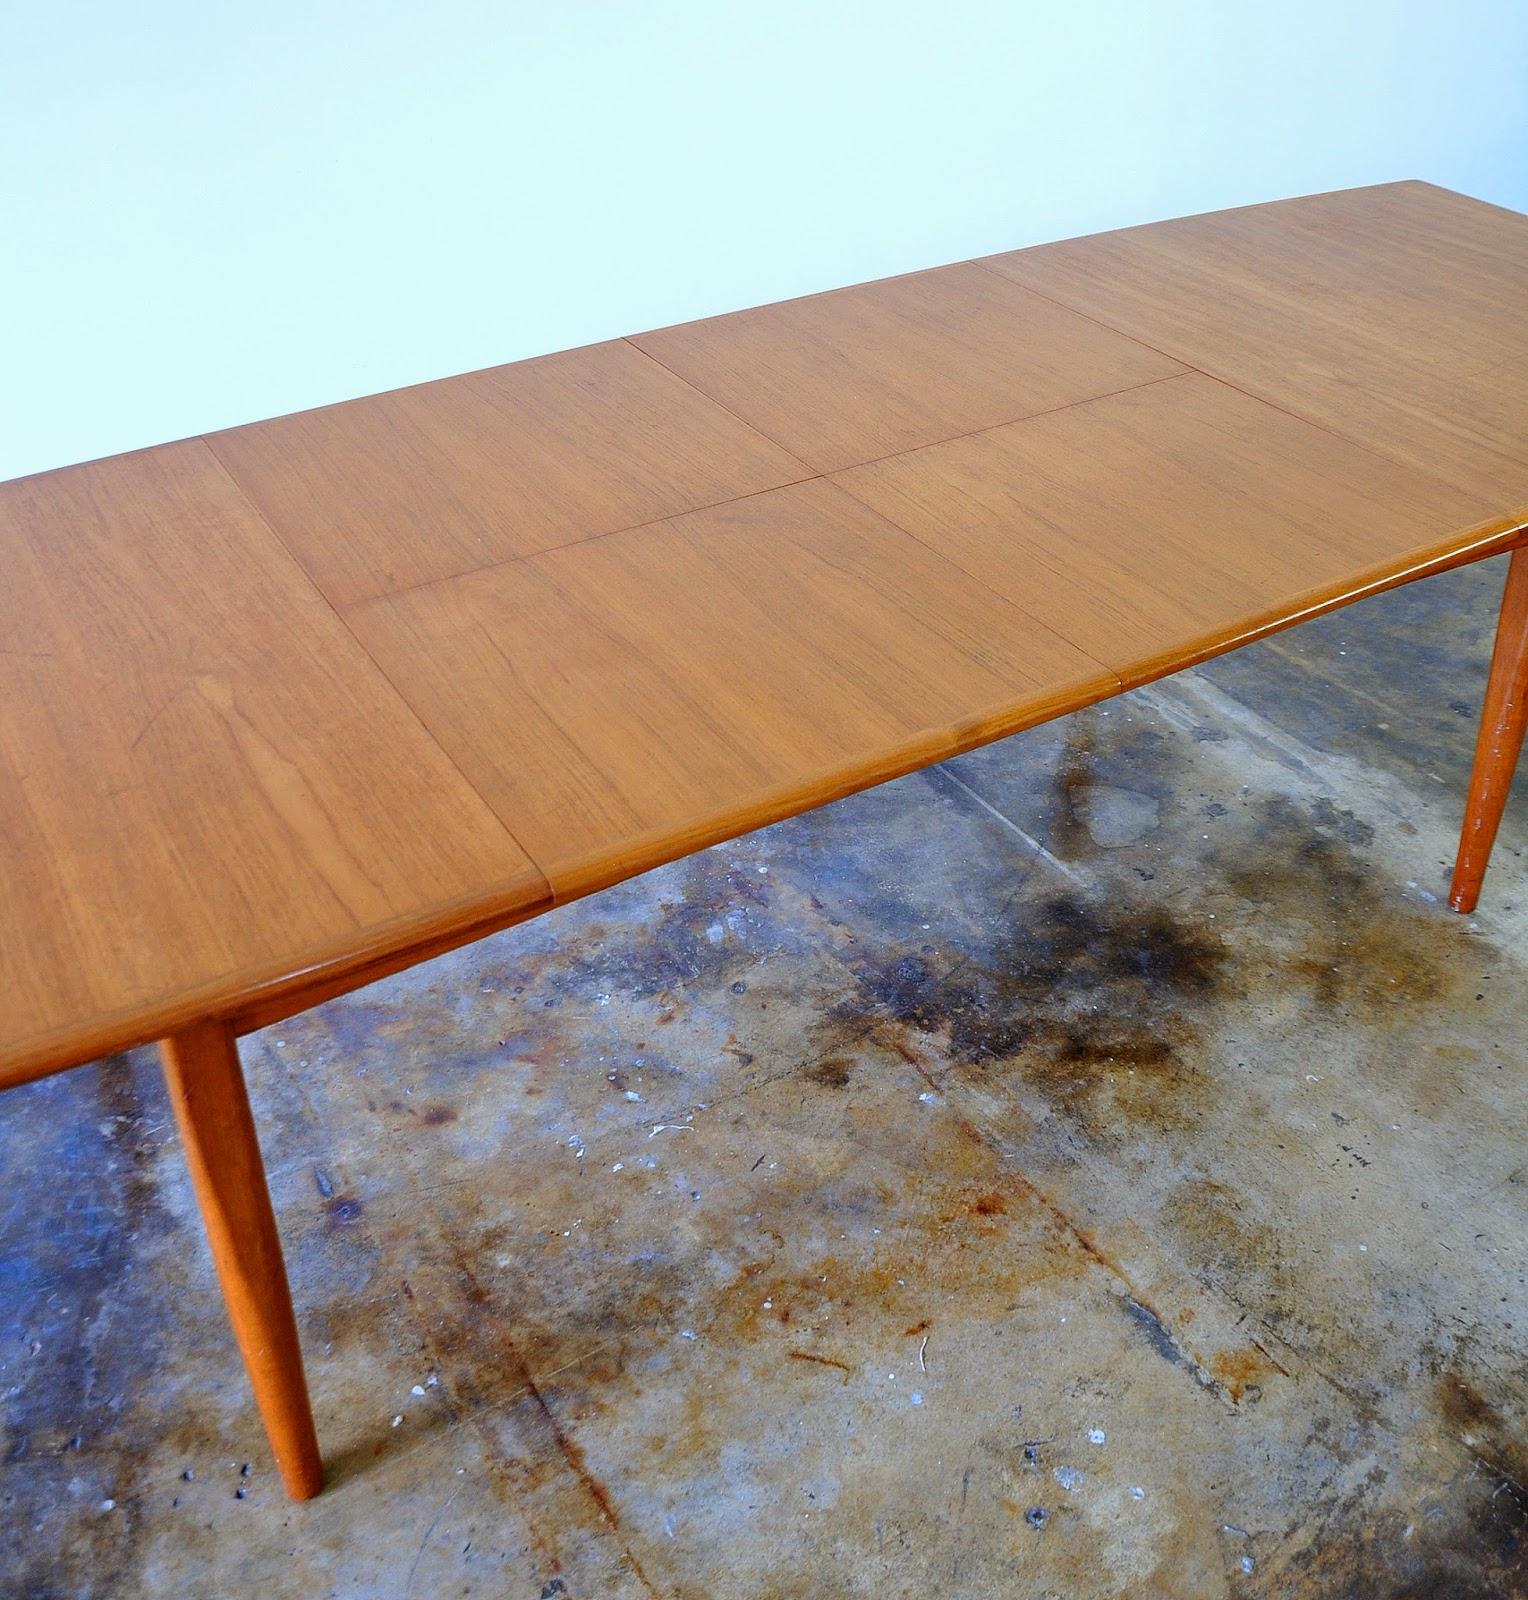 SELECT MODERN Falster Teak Expandable Dining Table : DanishModernFalsterTeakDiningTable15 from midcenturymoderndesignfinds.blogspot.com size 1528 x 1600 jpeg 530kB